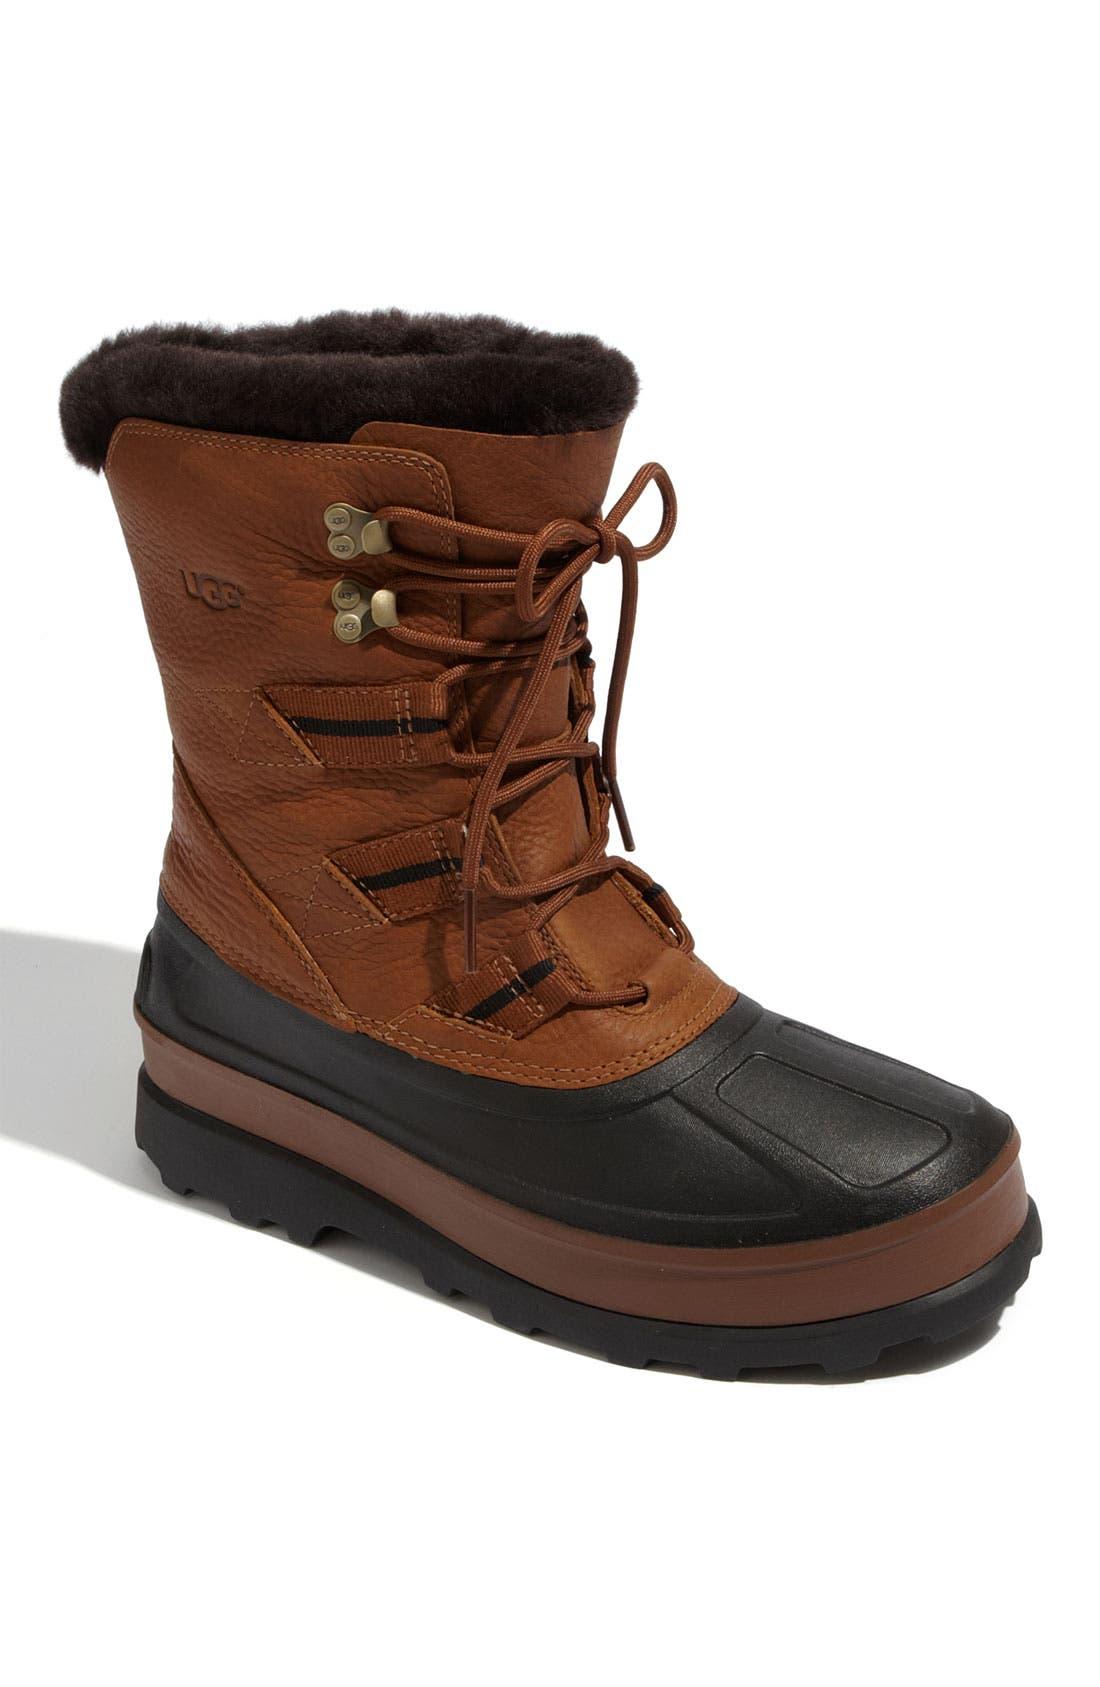 Alternate Image 1 Selected - UGG® Australia 'Capitan' Boot